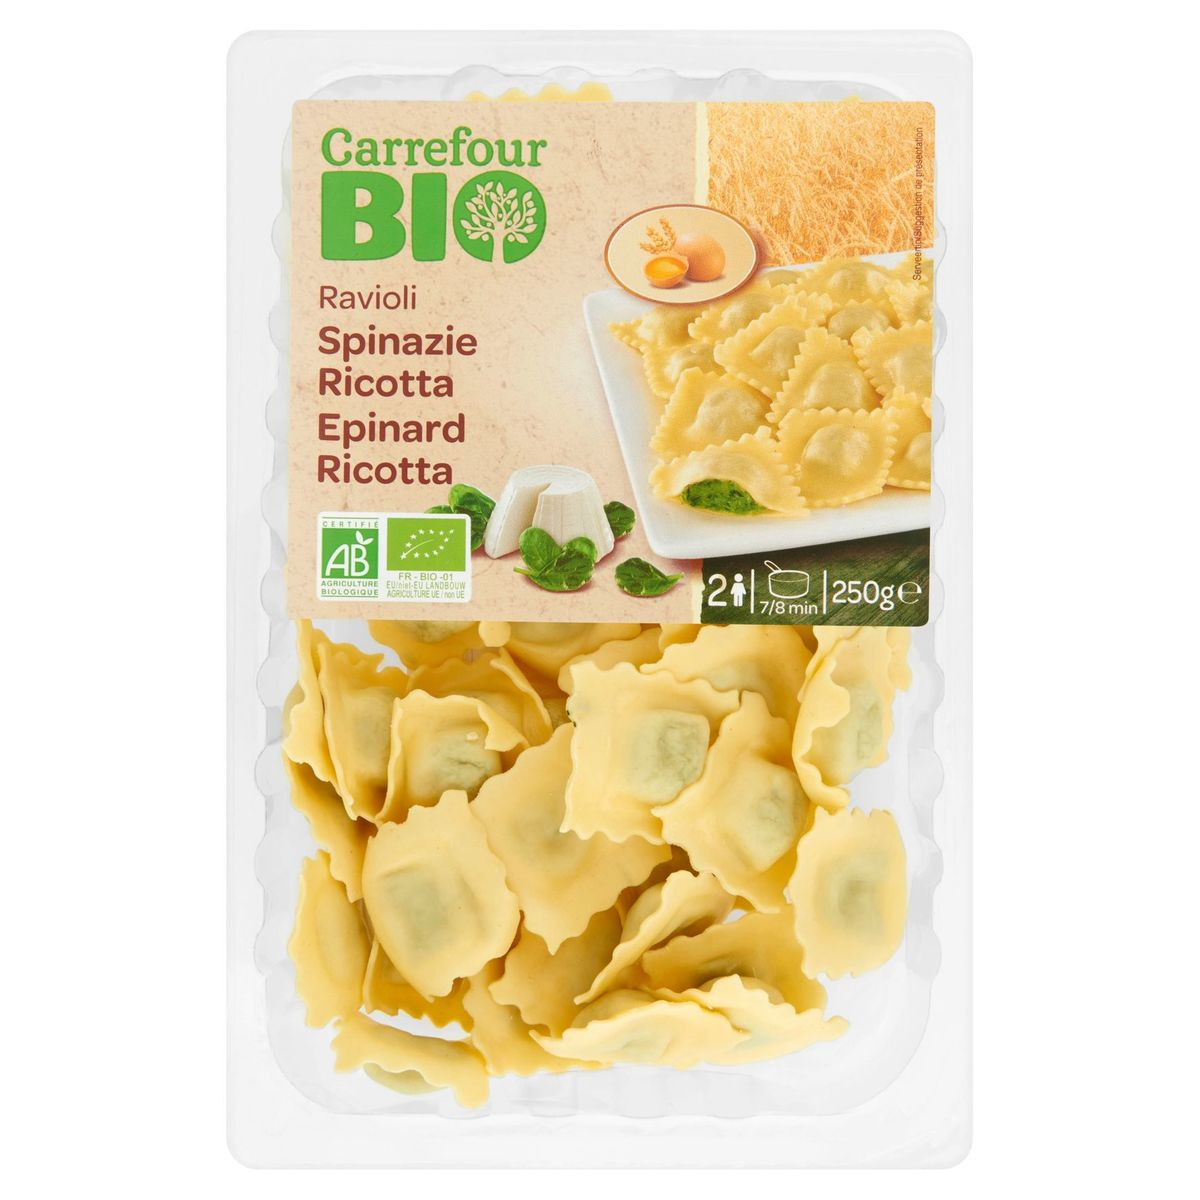 Carrefour Bio Ravioli Spinazie Ricotta 250 g